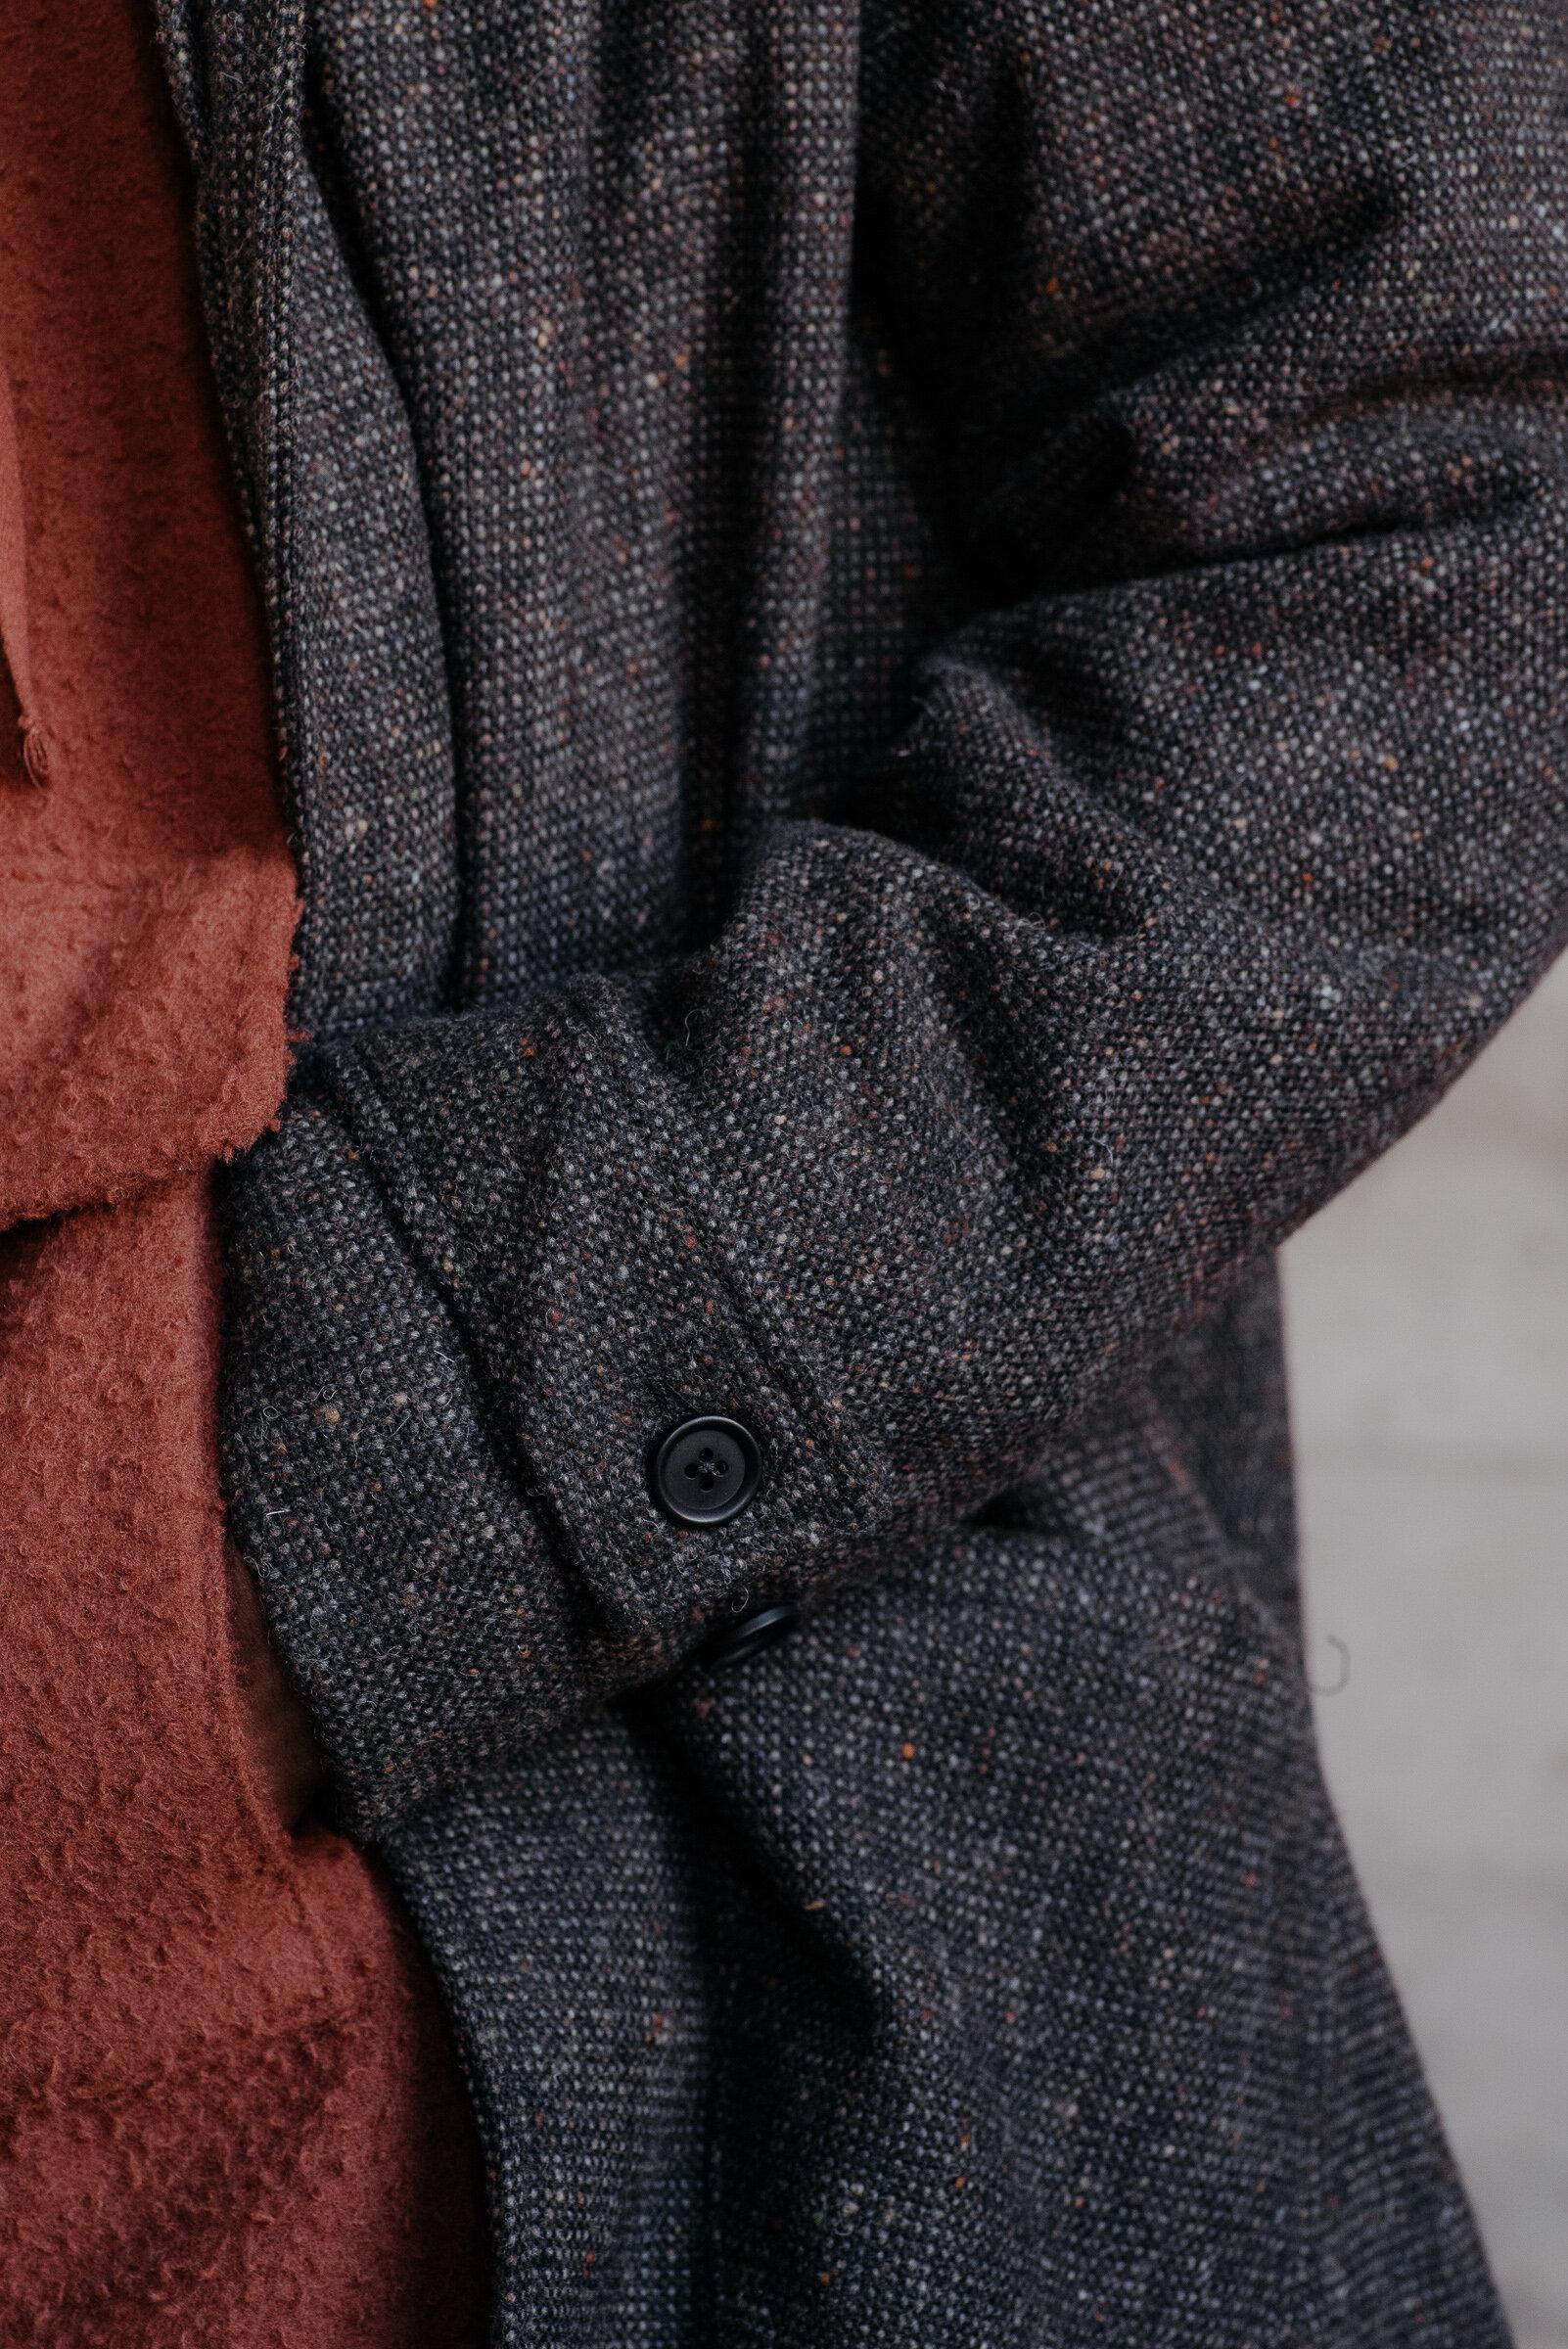 evan-kinori-covered-placket-coat-wool-tweed-woven-in-ireland-molloy-and-sons-7